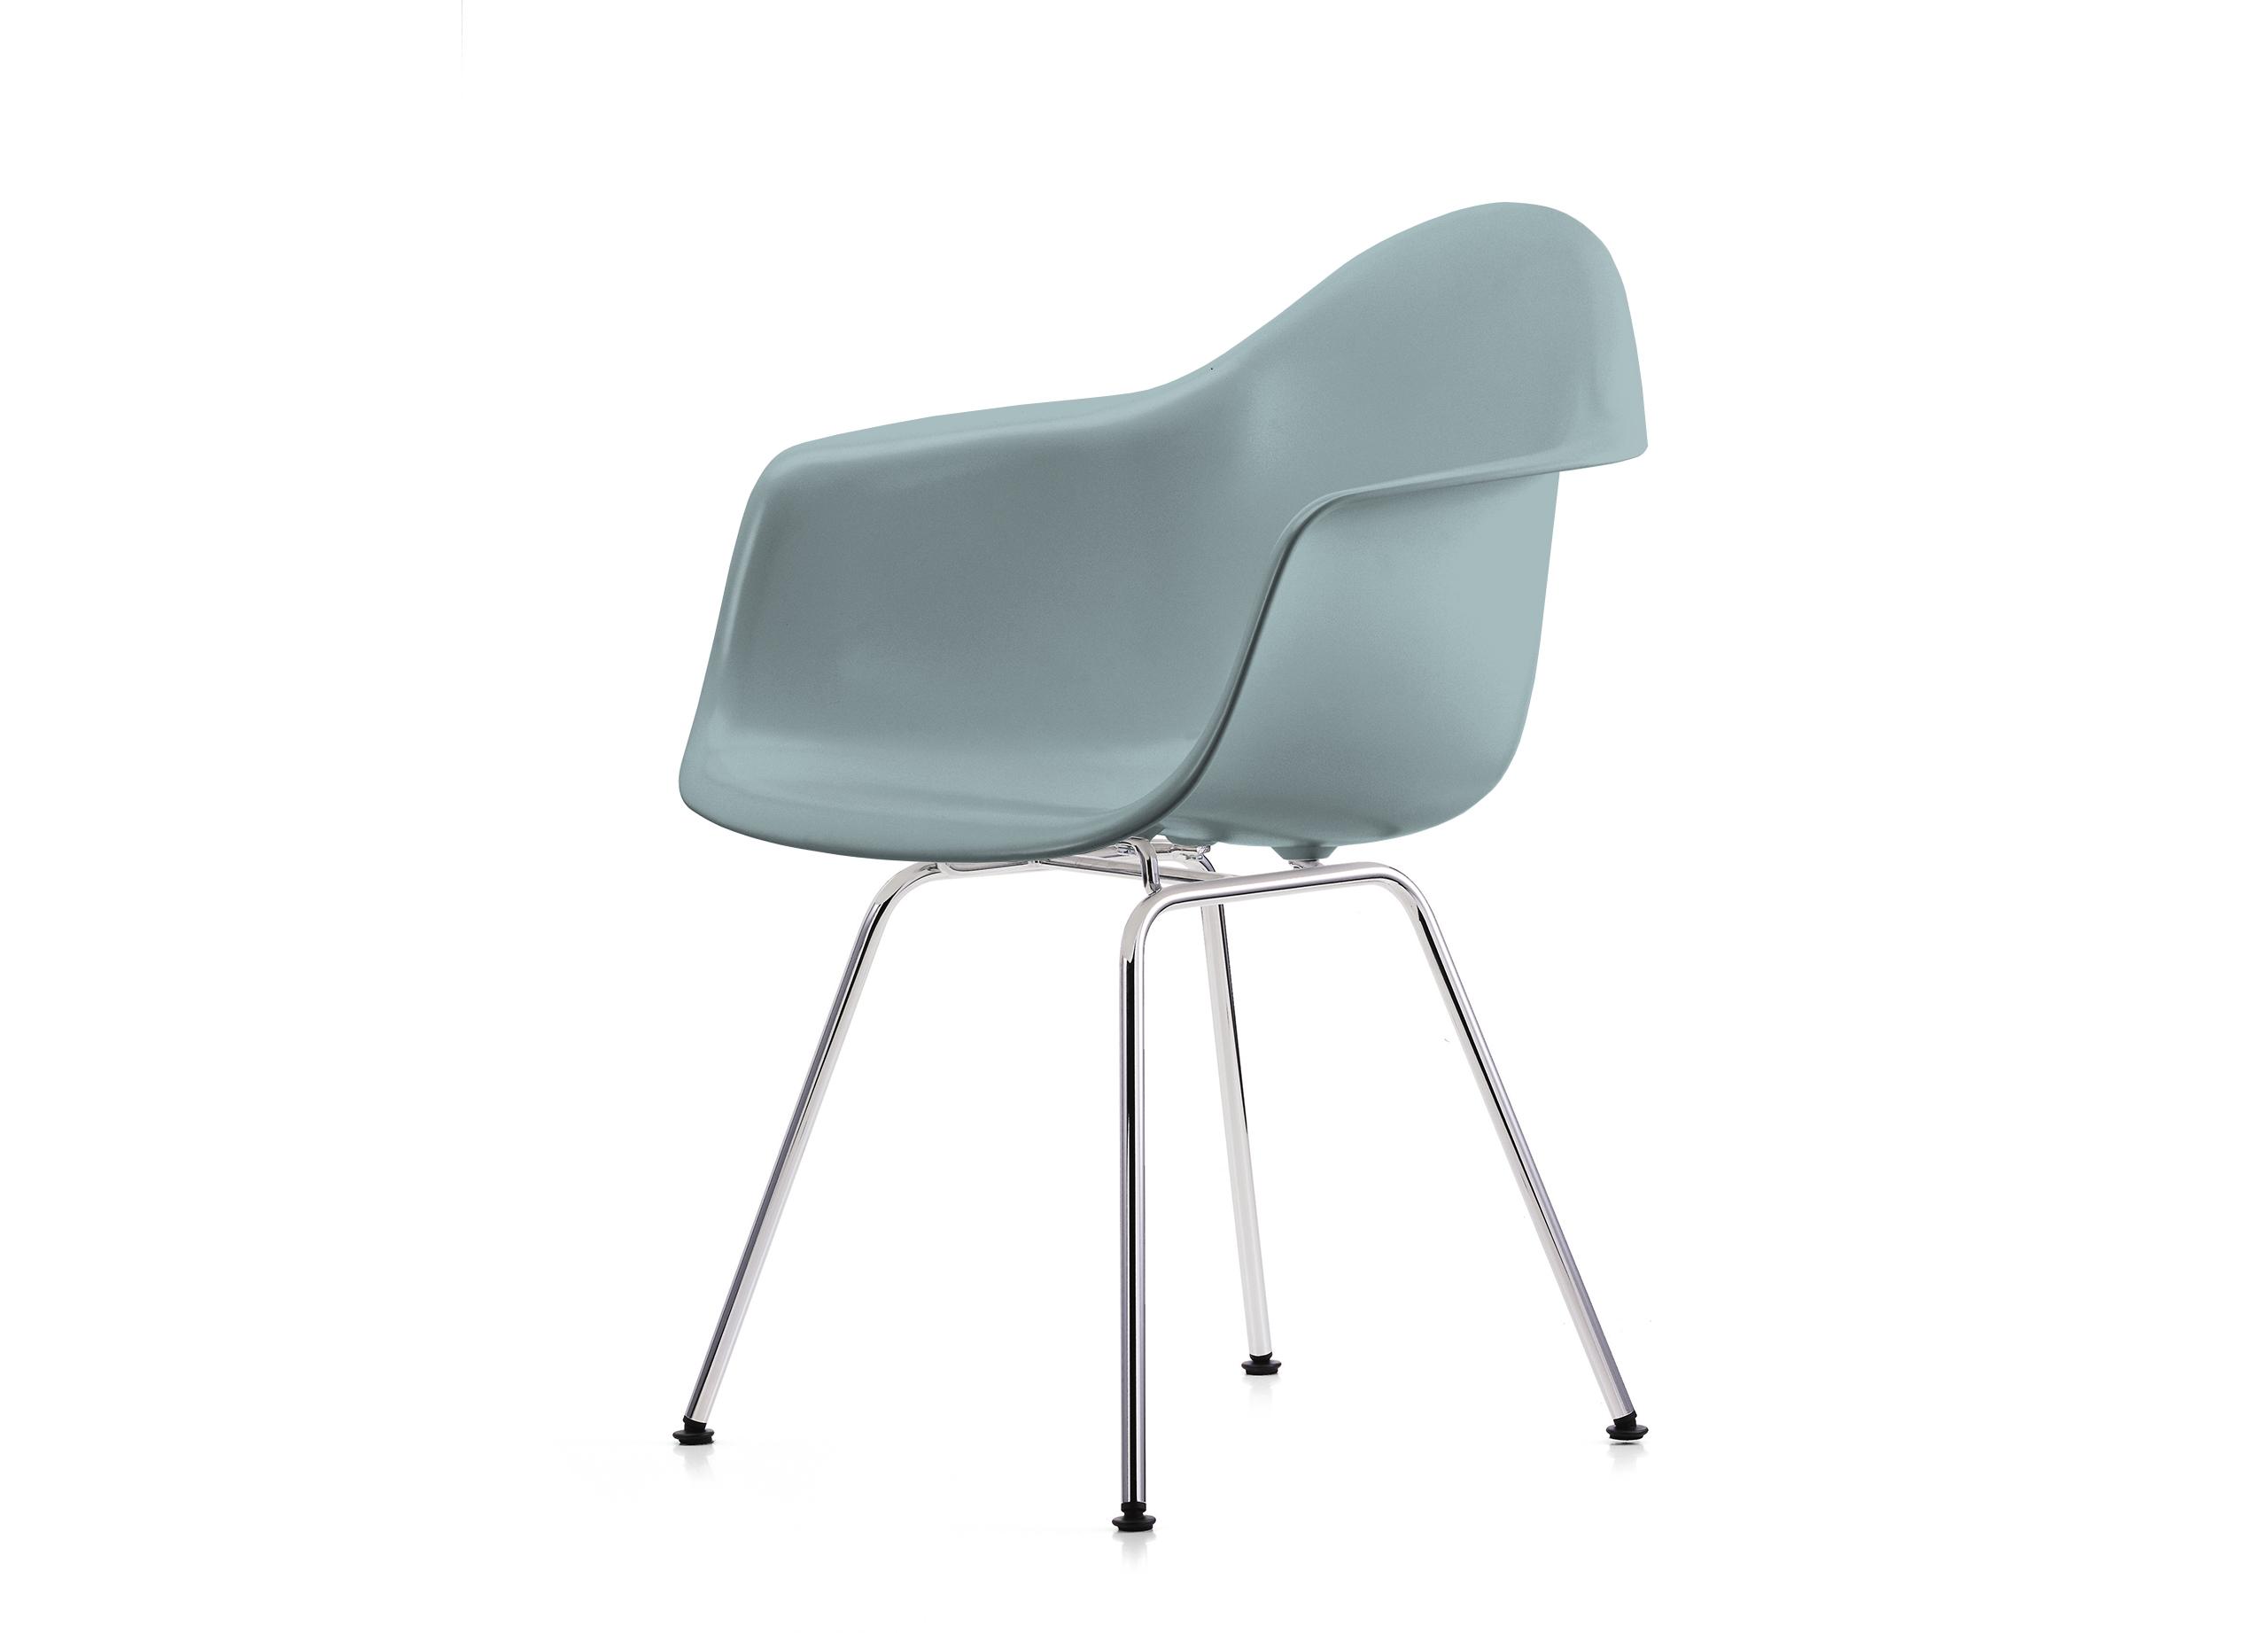 Eames Plastic Armchair : Vitra dax eames plastic armchair the qvest shop